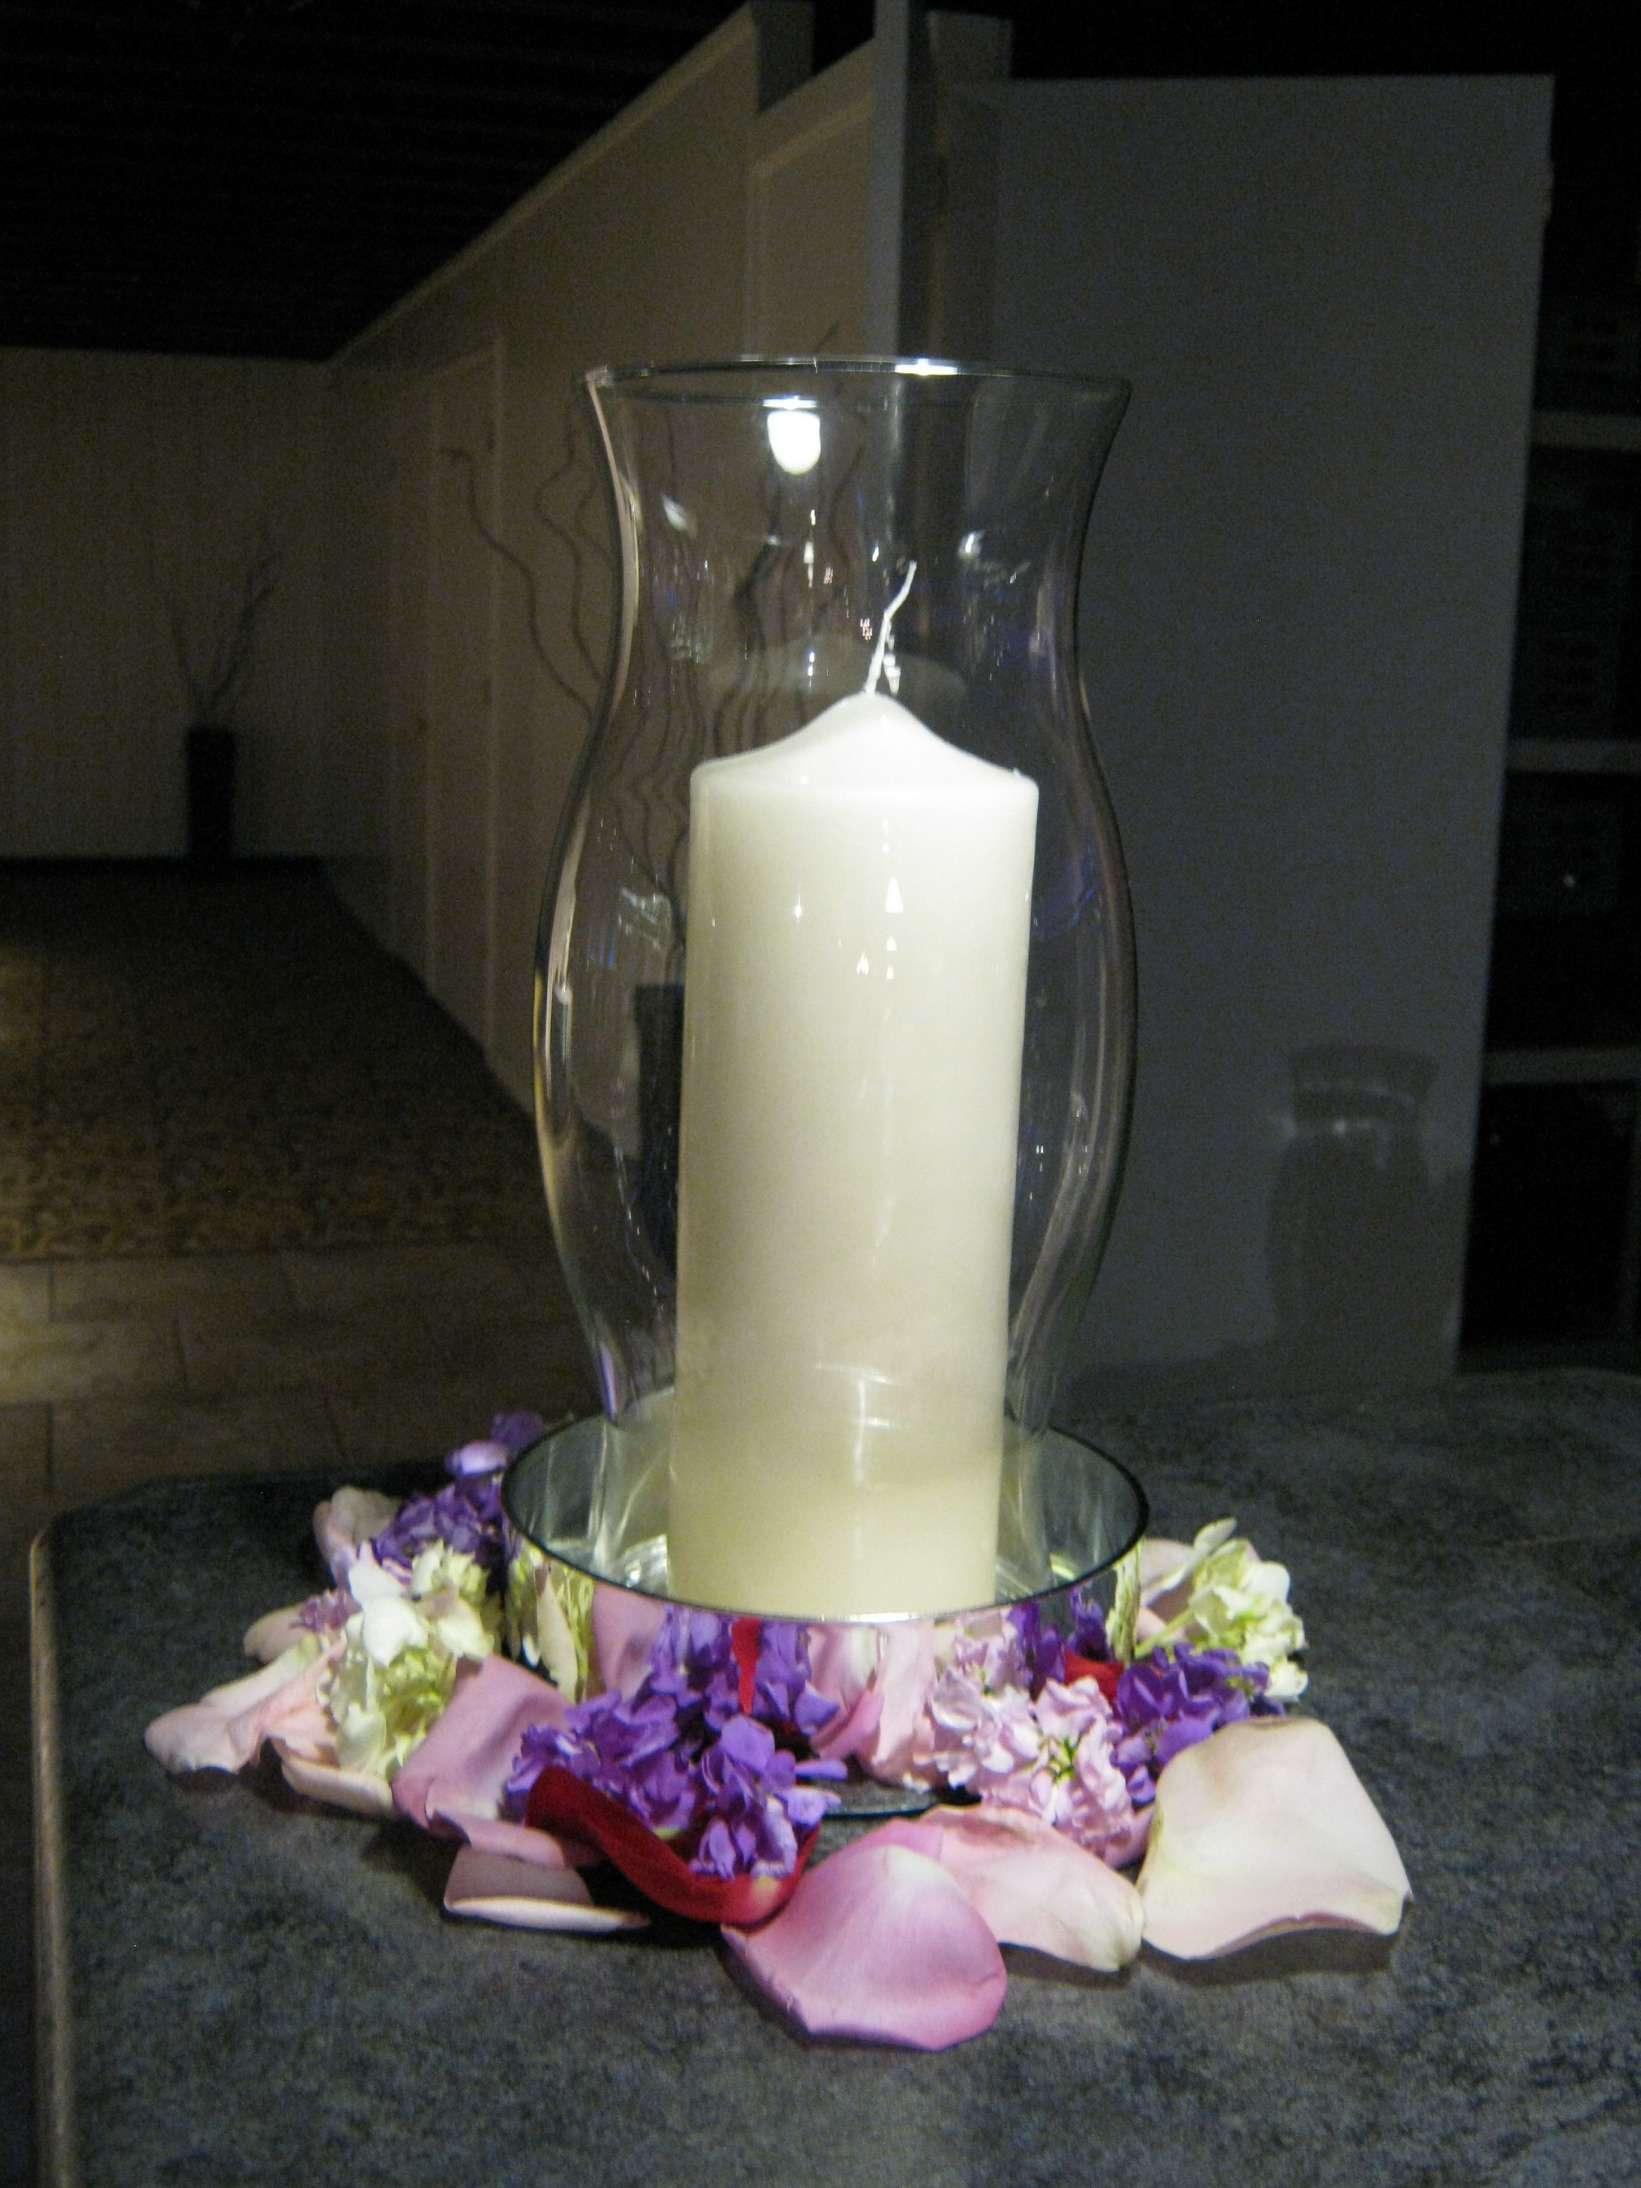 candle vases in bulk of large hurricane vase inspirational since hurricane vase with candle pertaining to large hurricane vase inspirational since hurricane vase with candle and flowers at the base